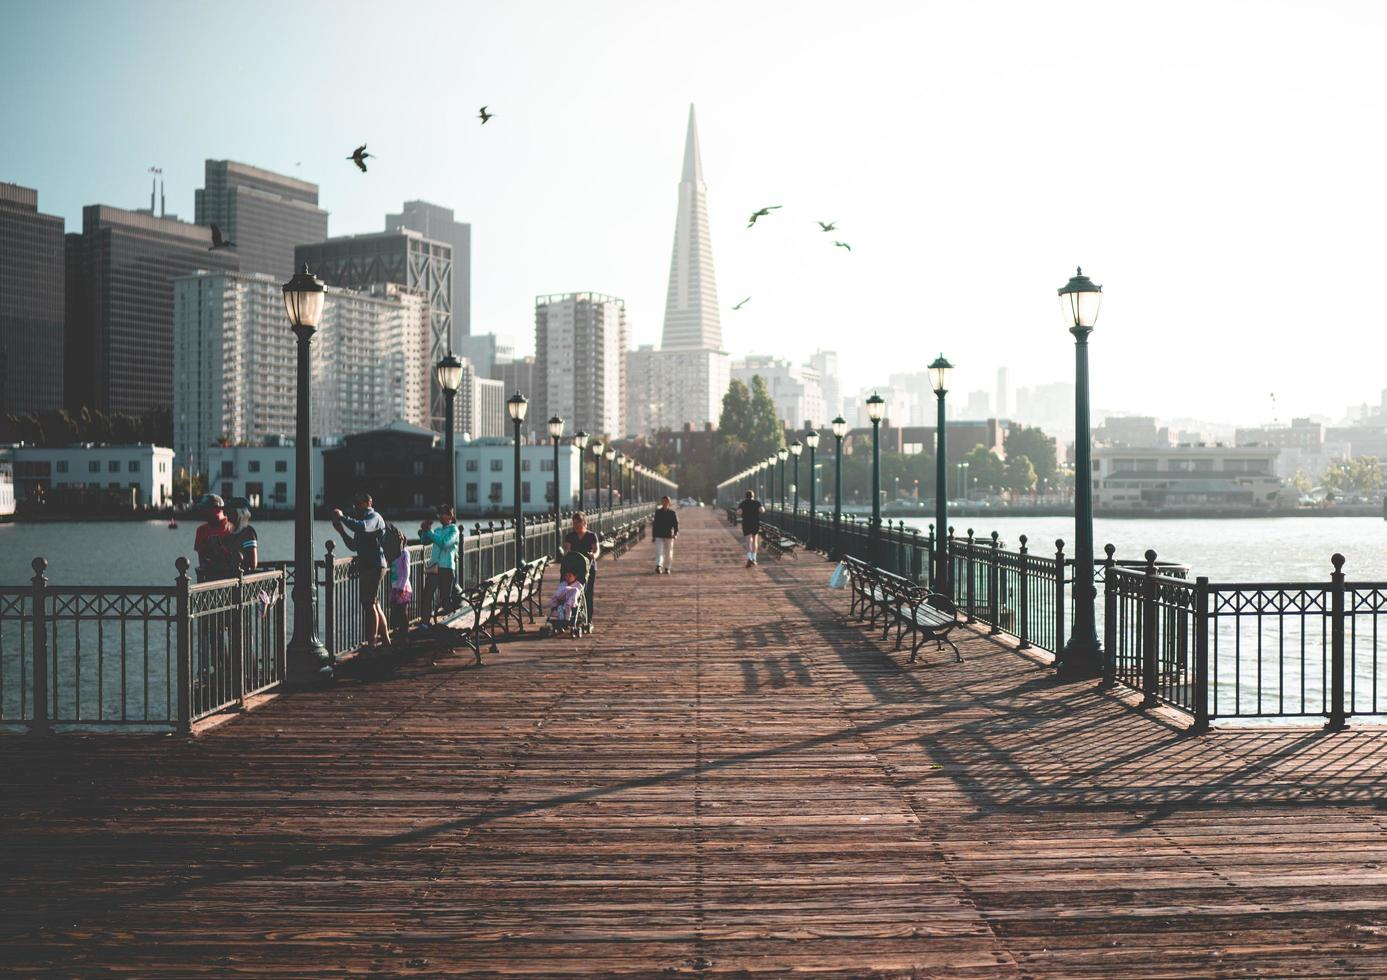 san fransisco, ca 2018-toeristen langs de promenade van pier 7 foto